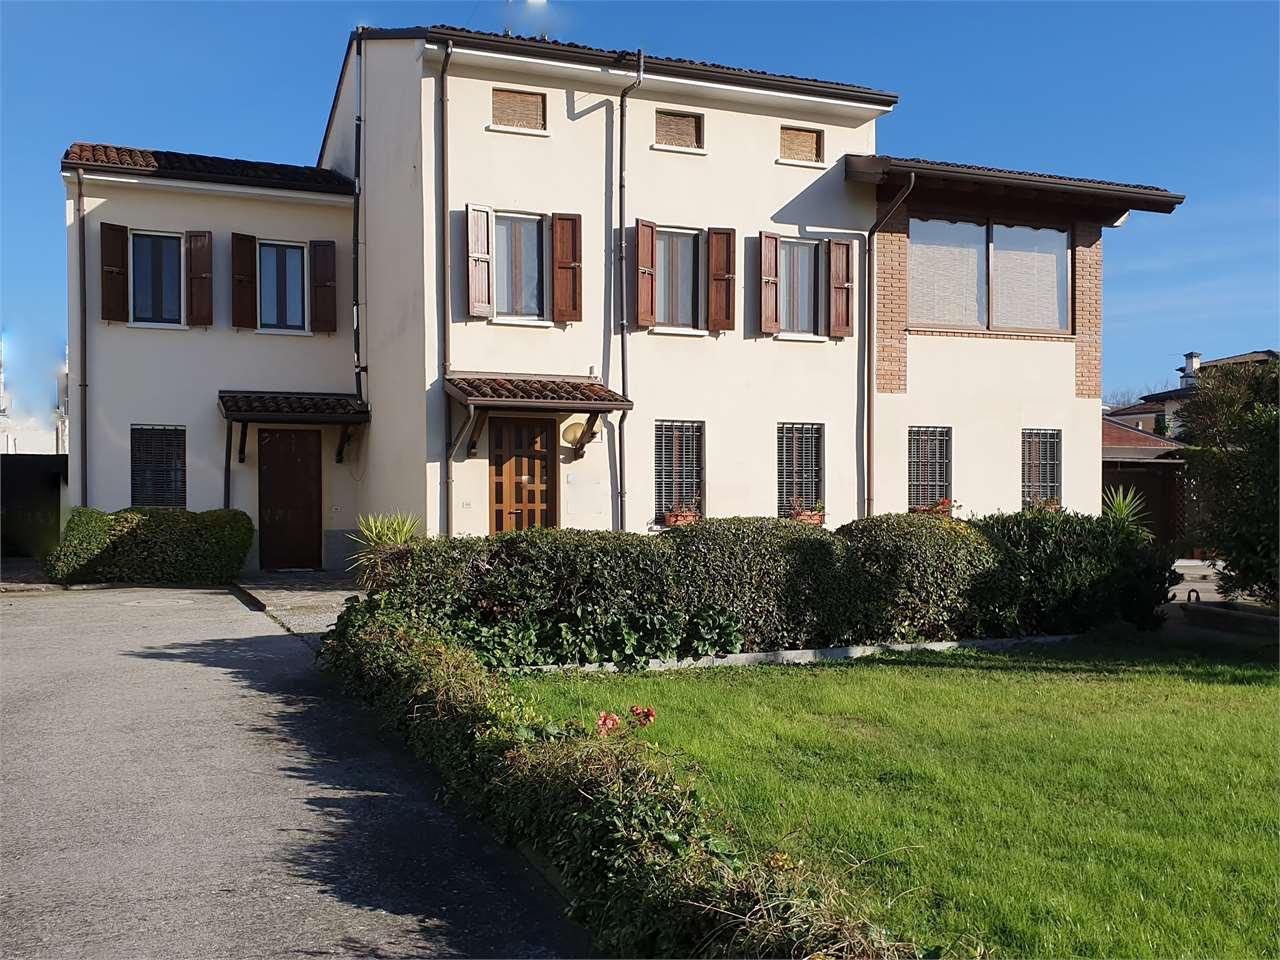 Villa singola Castel Goffredo 225A